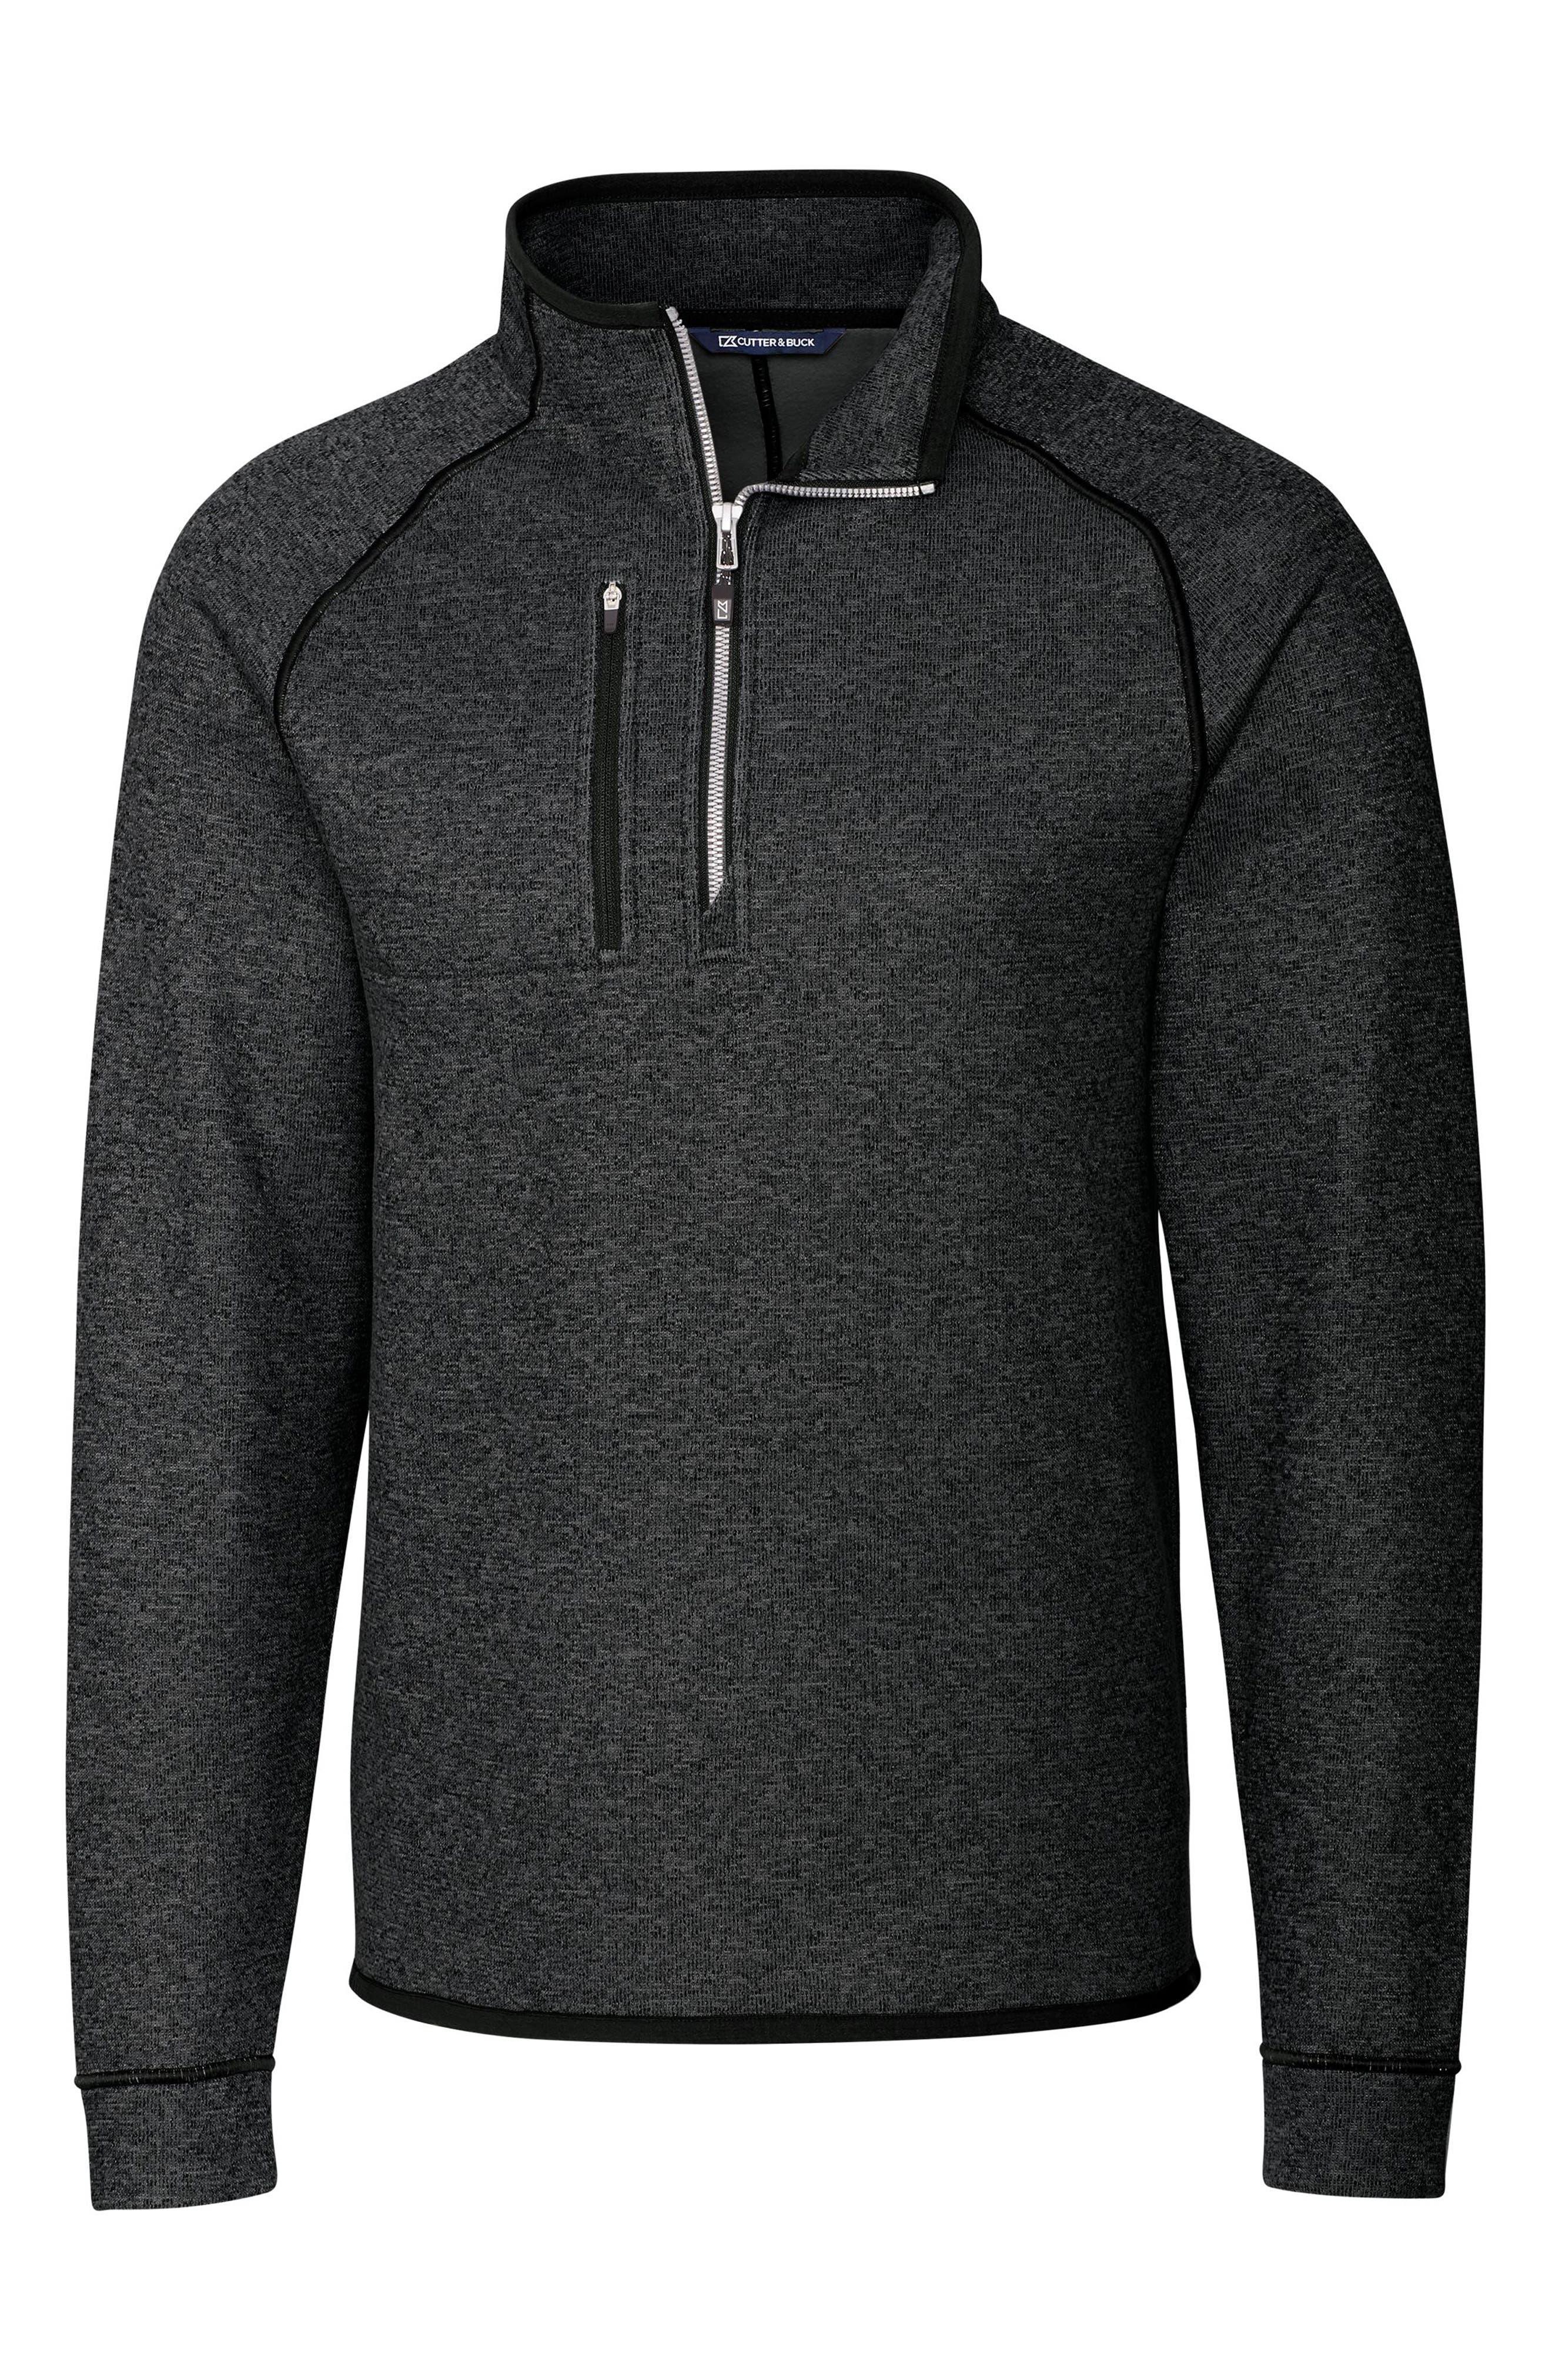 Mainsail Half Zip Pullover